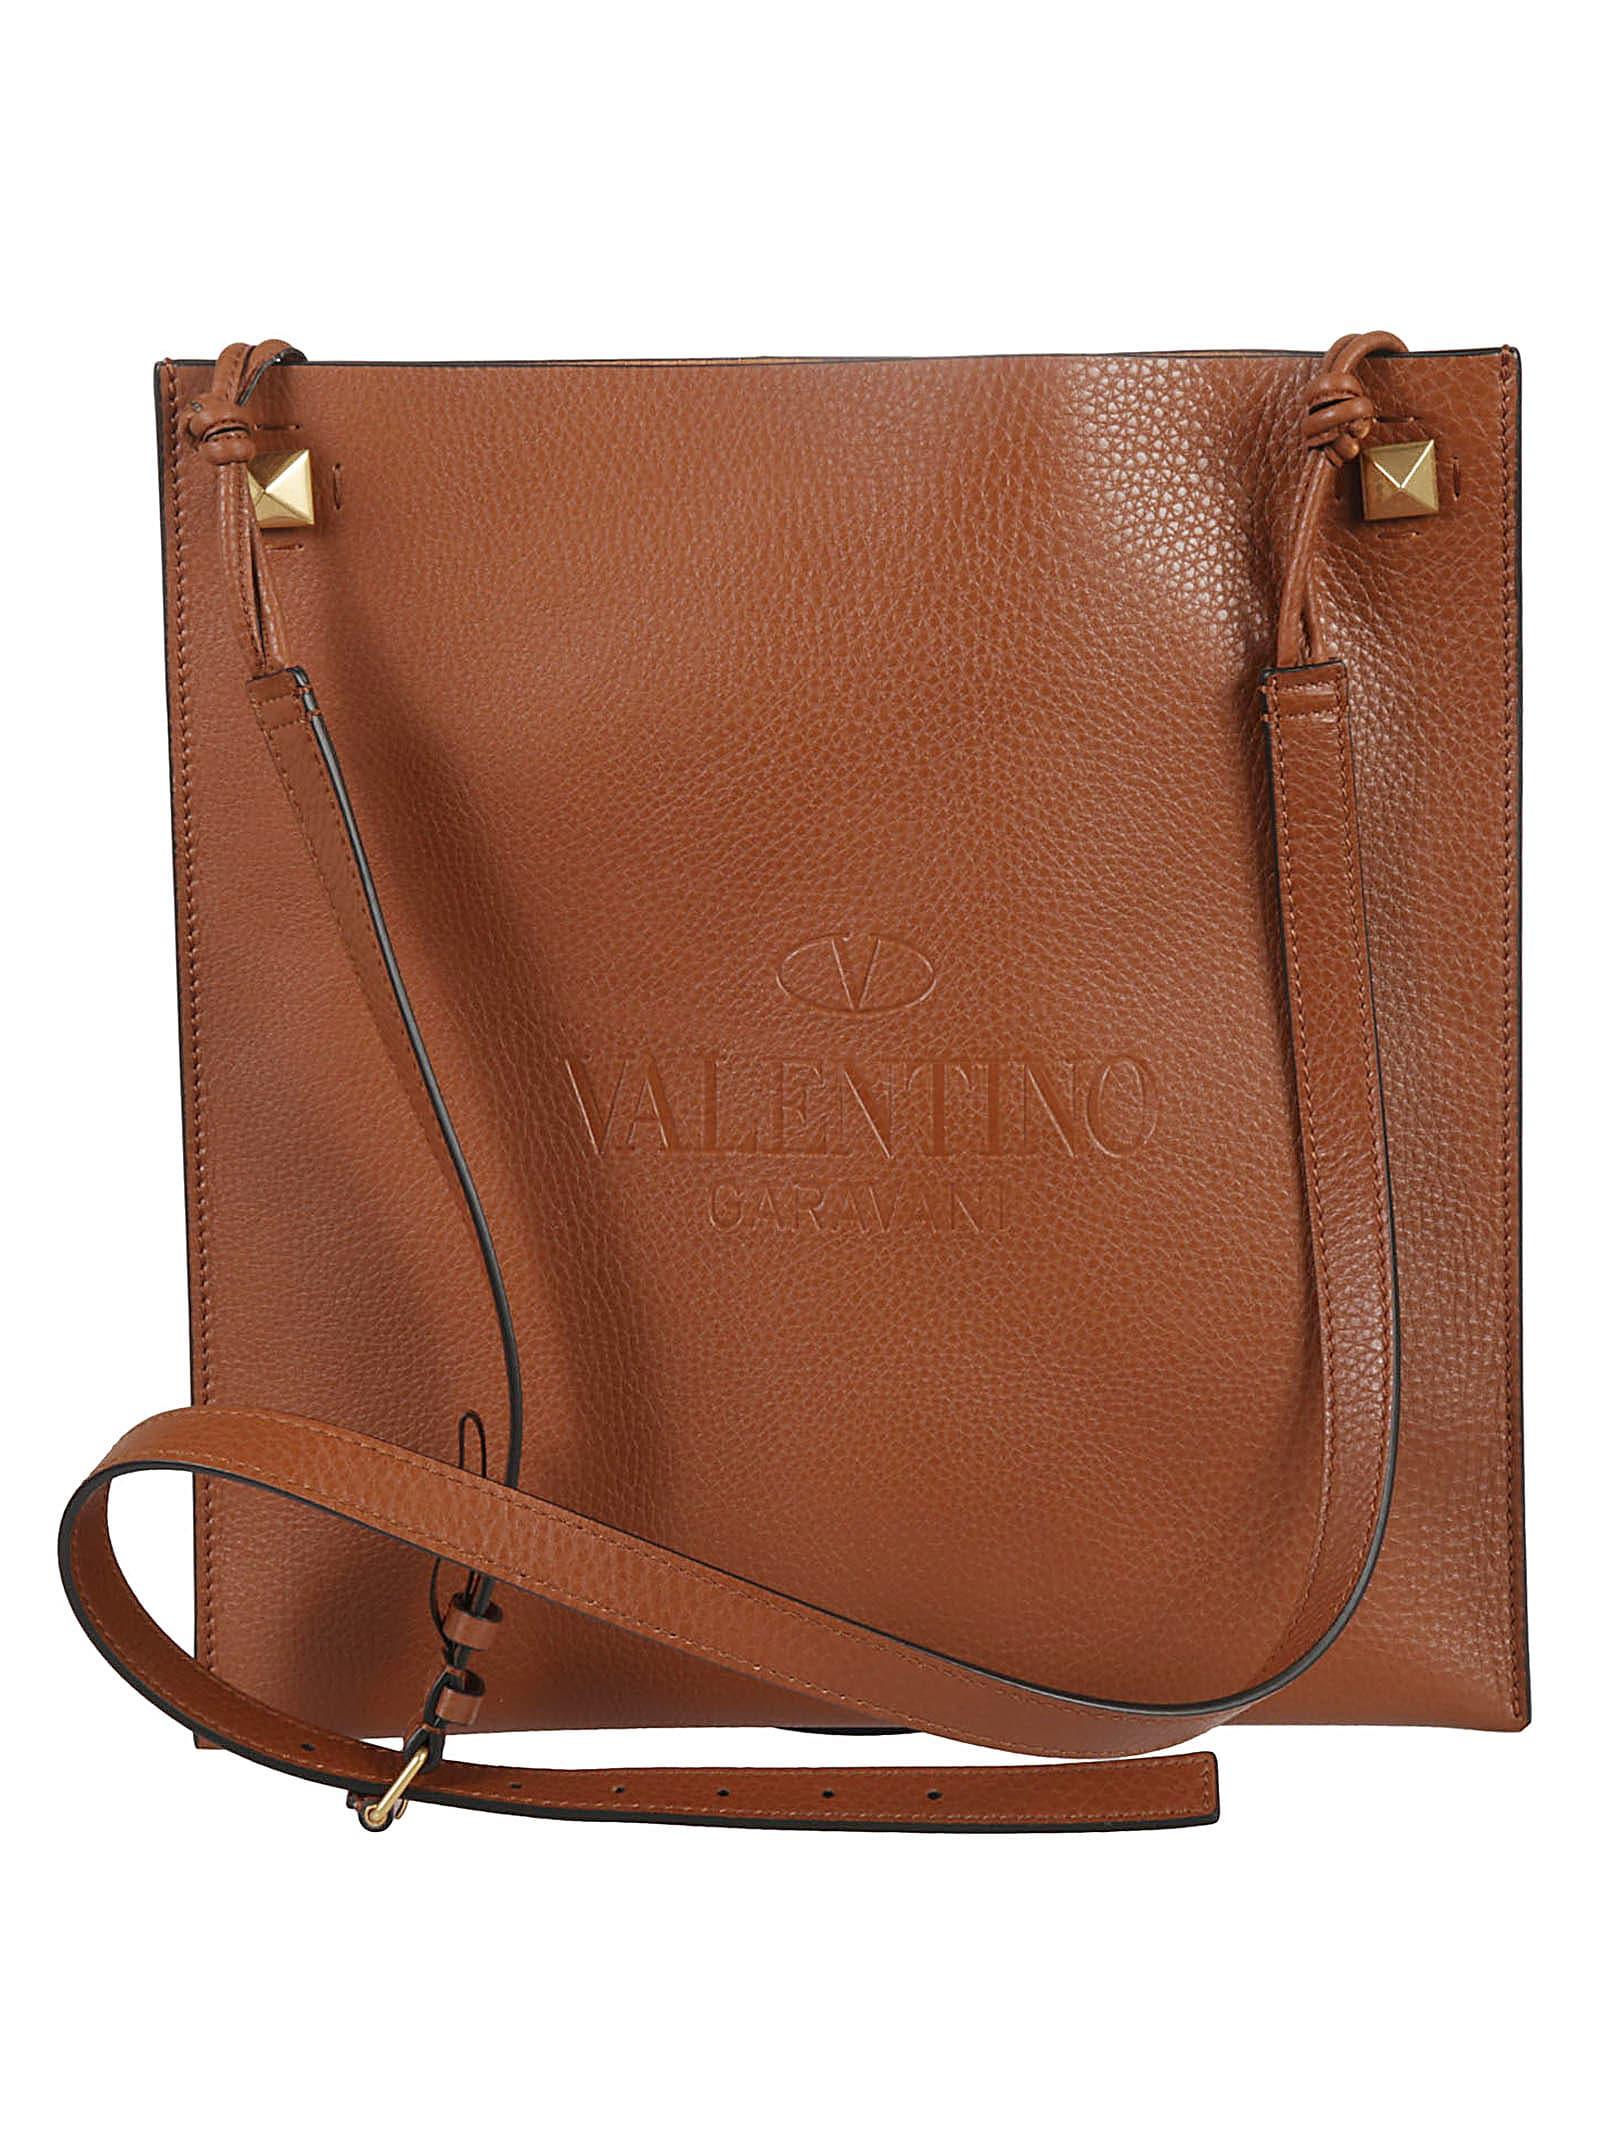 Valentino Bags FLAT CROSSBODY BAG